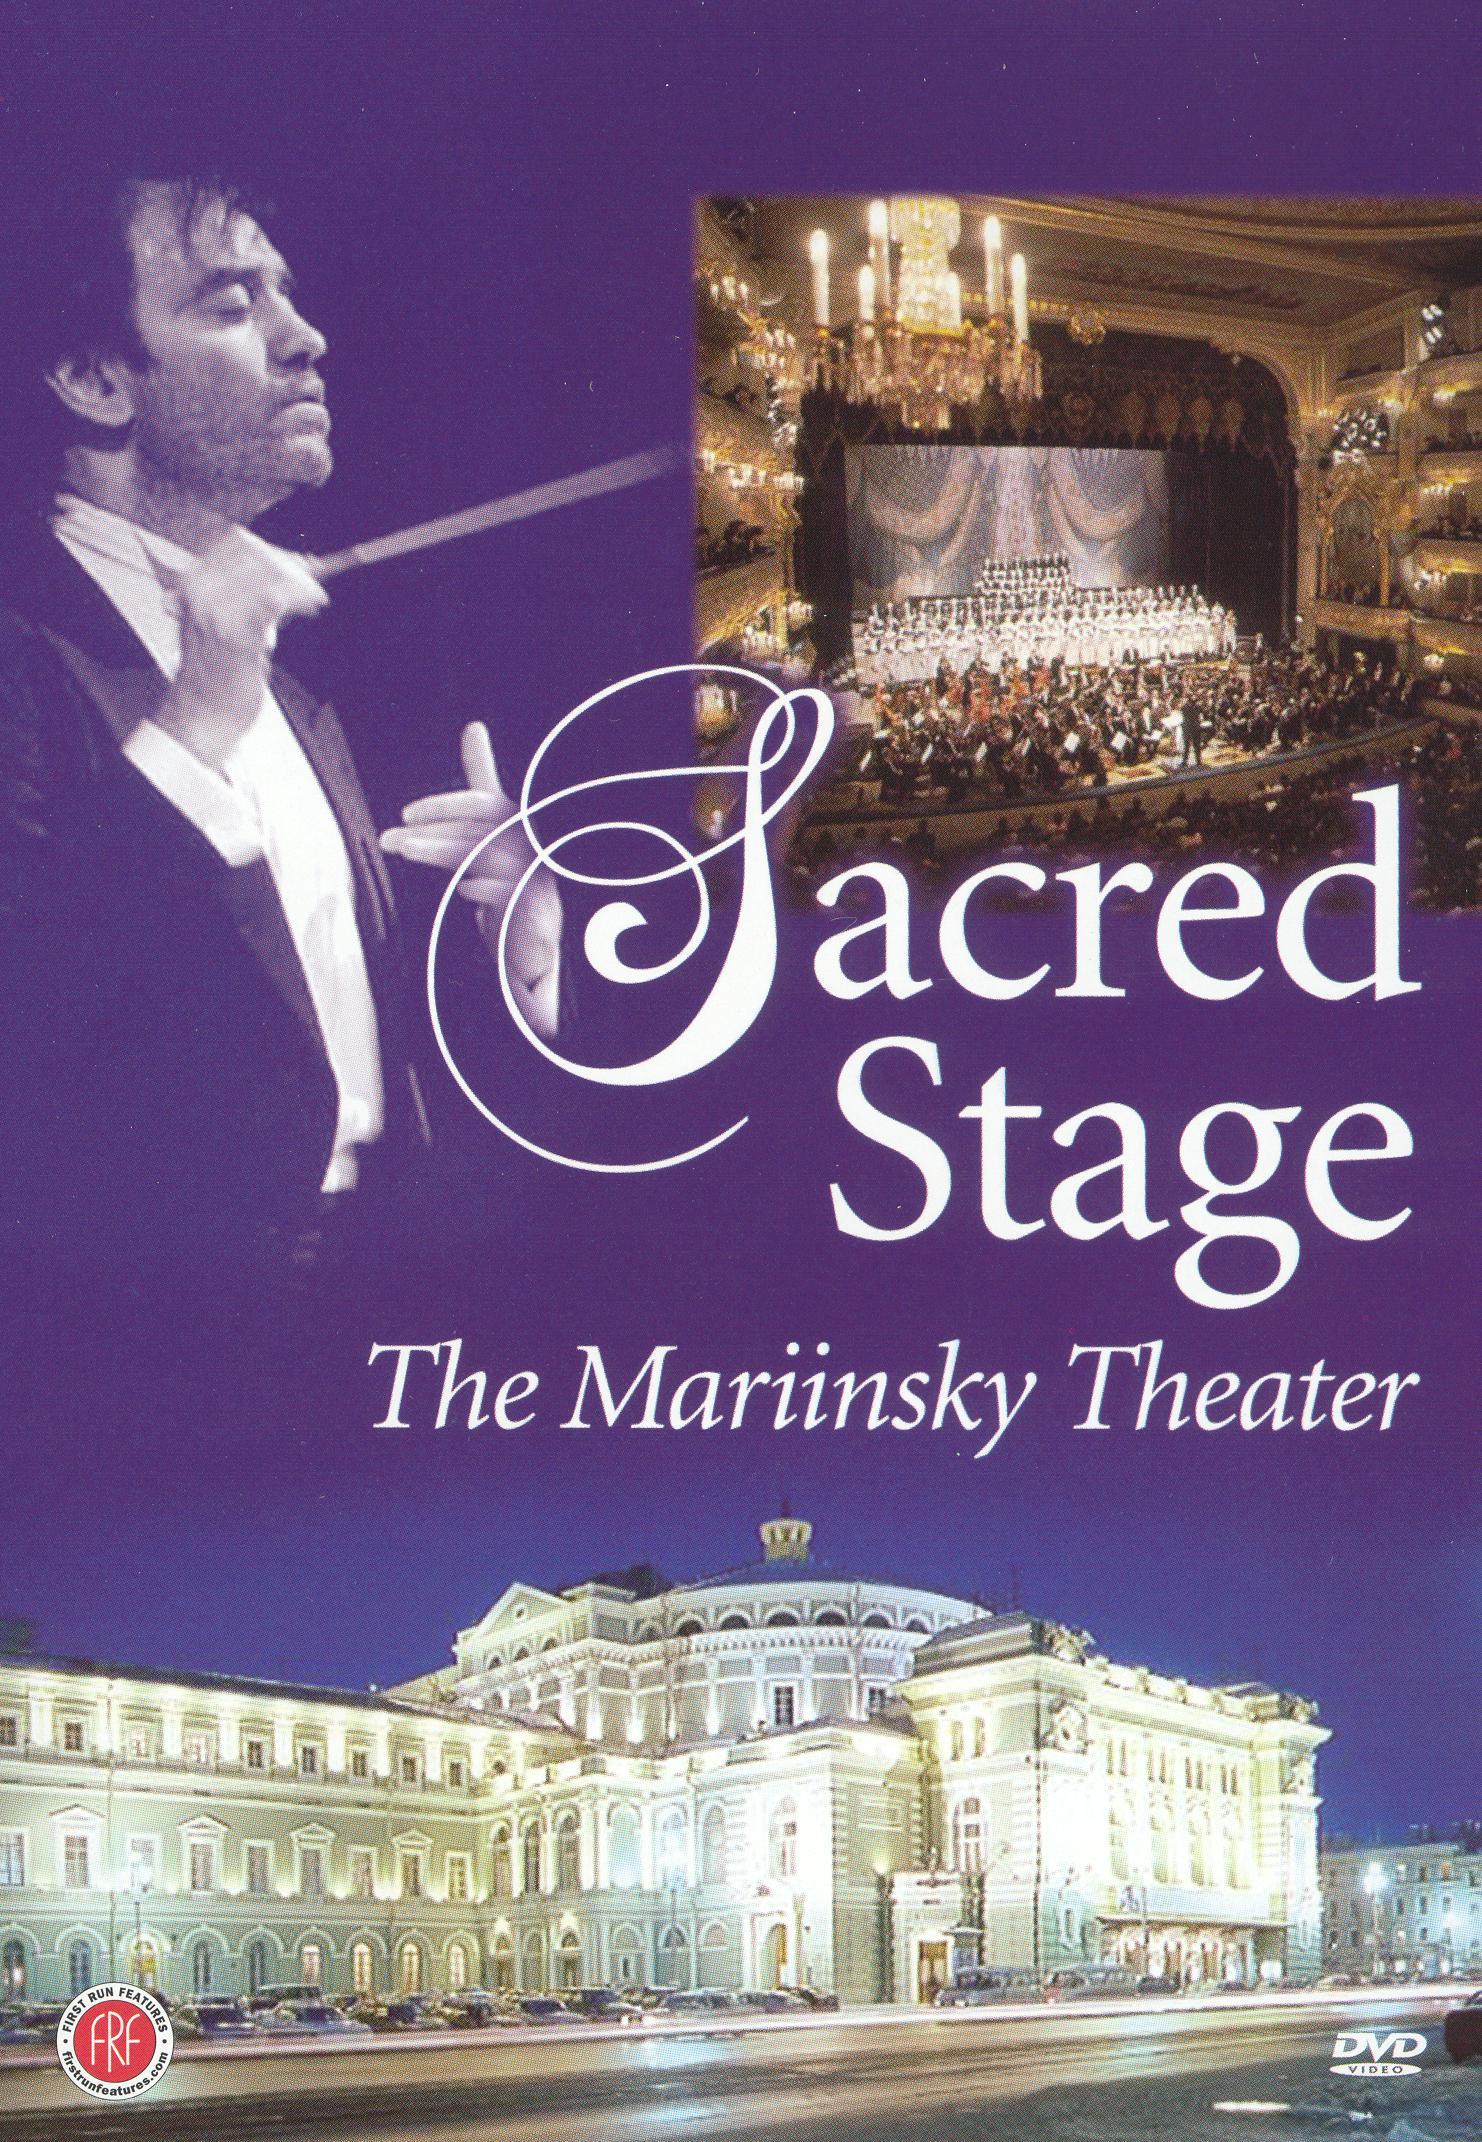 Sacred Stage: The Mariinski Theater